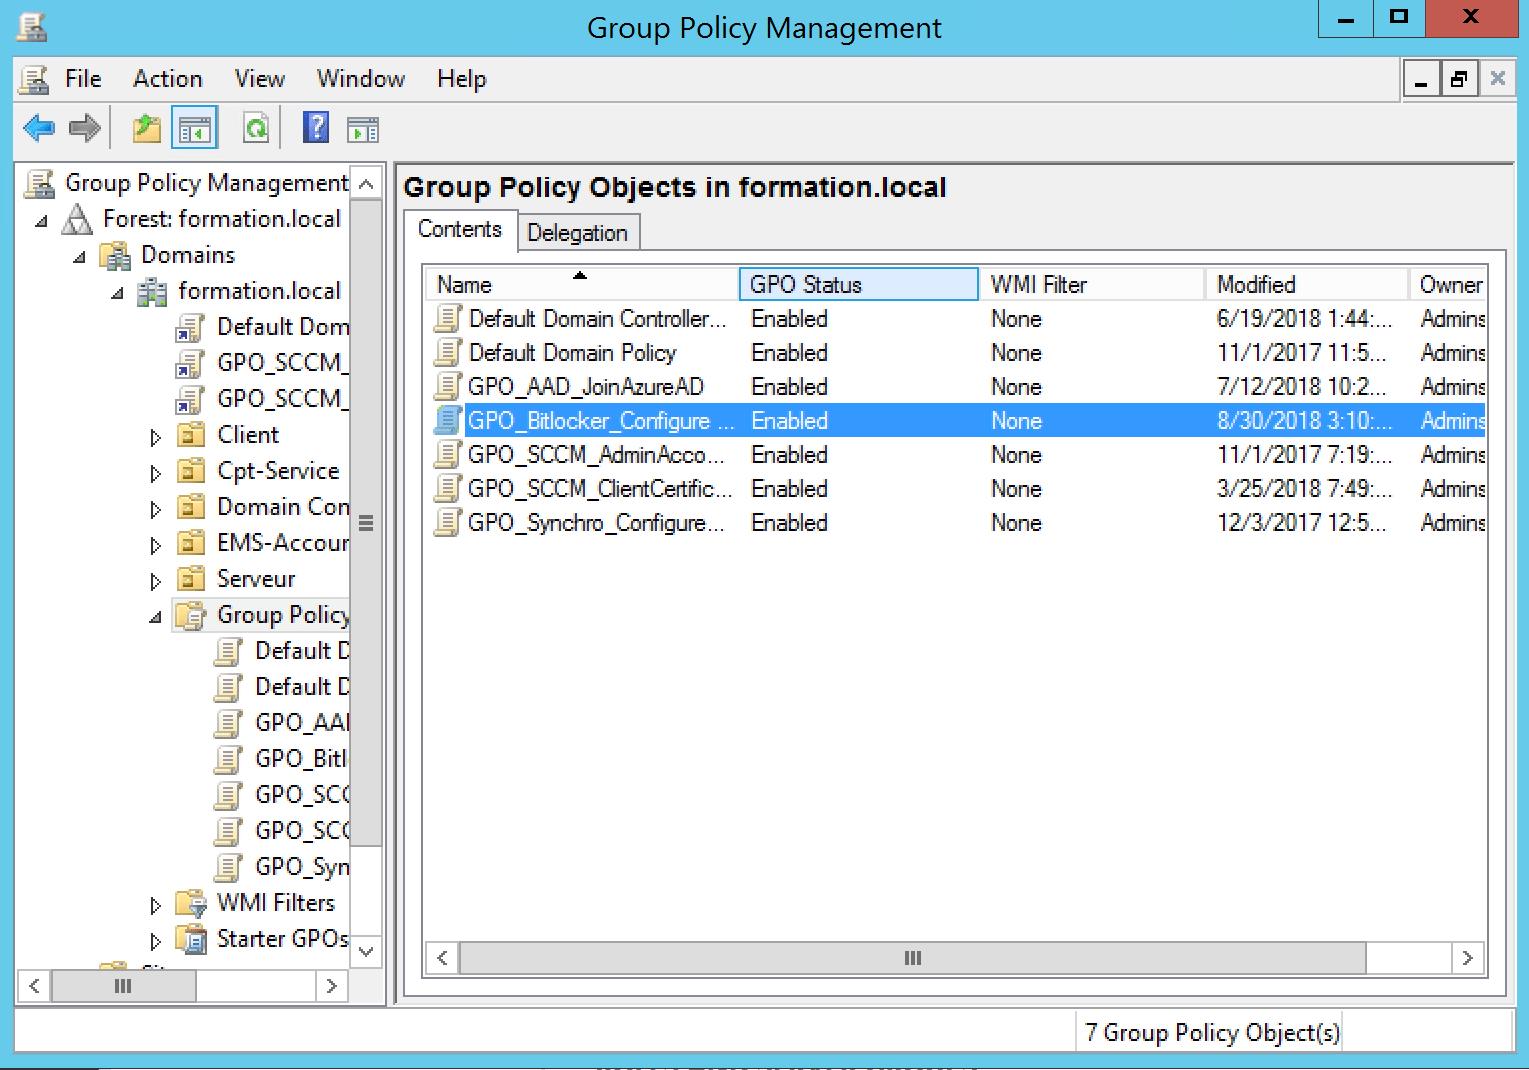 Secure your desktop with Bitlocker Edit Group Policy for configure Bitlocker parameter